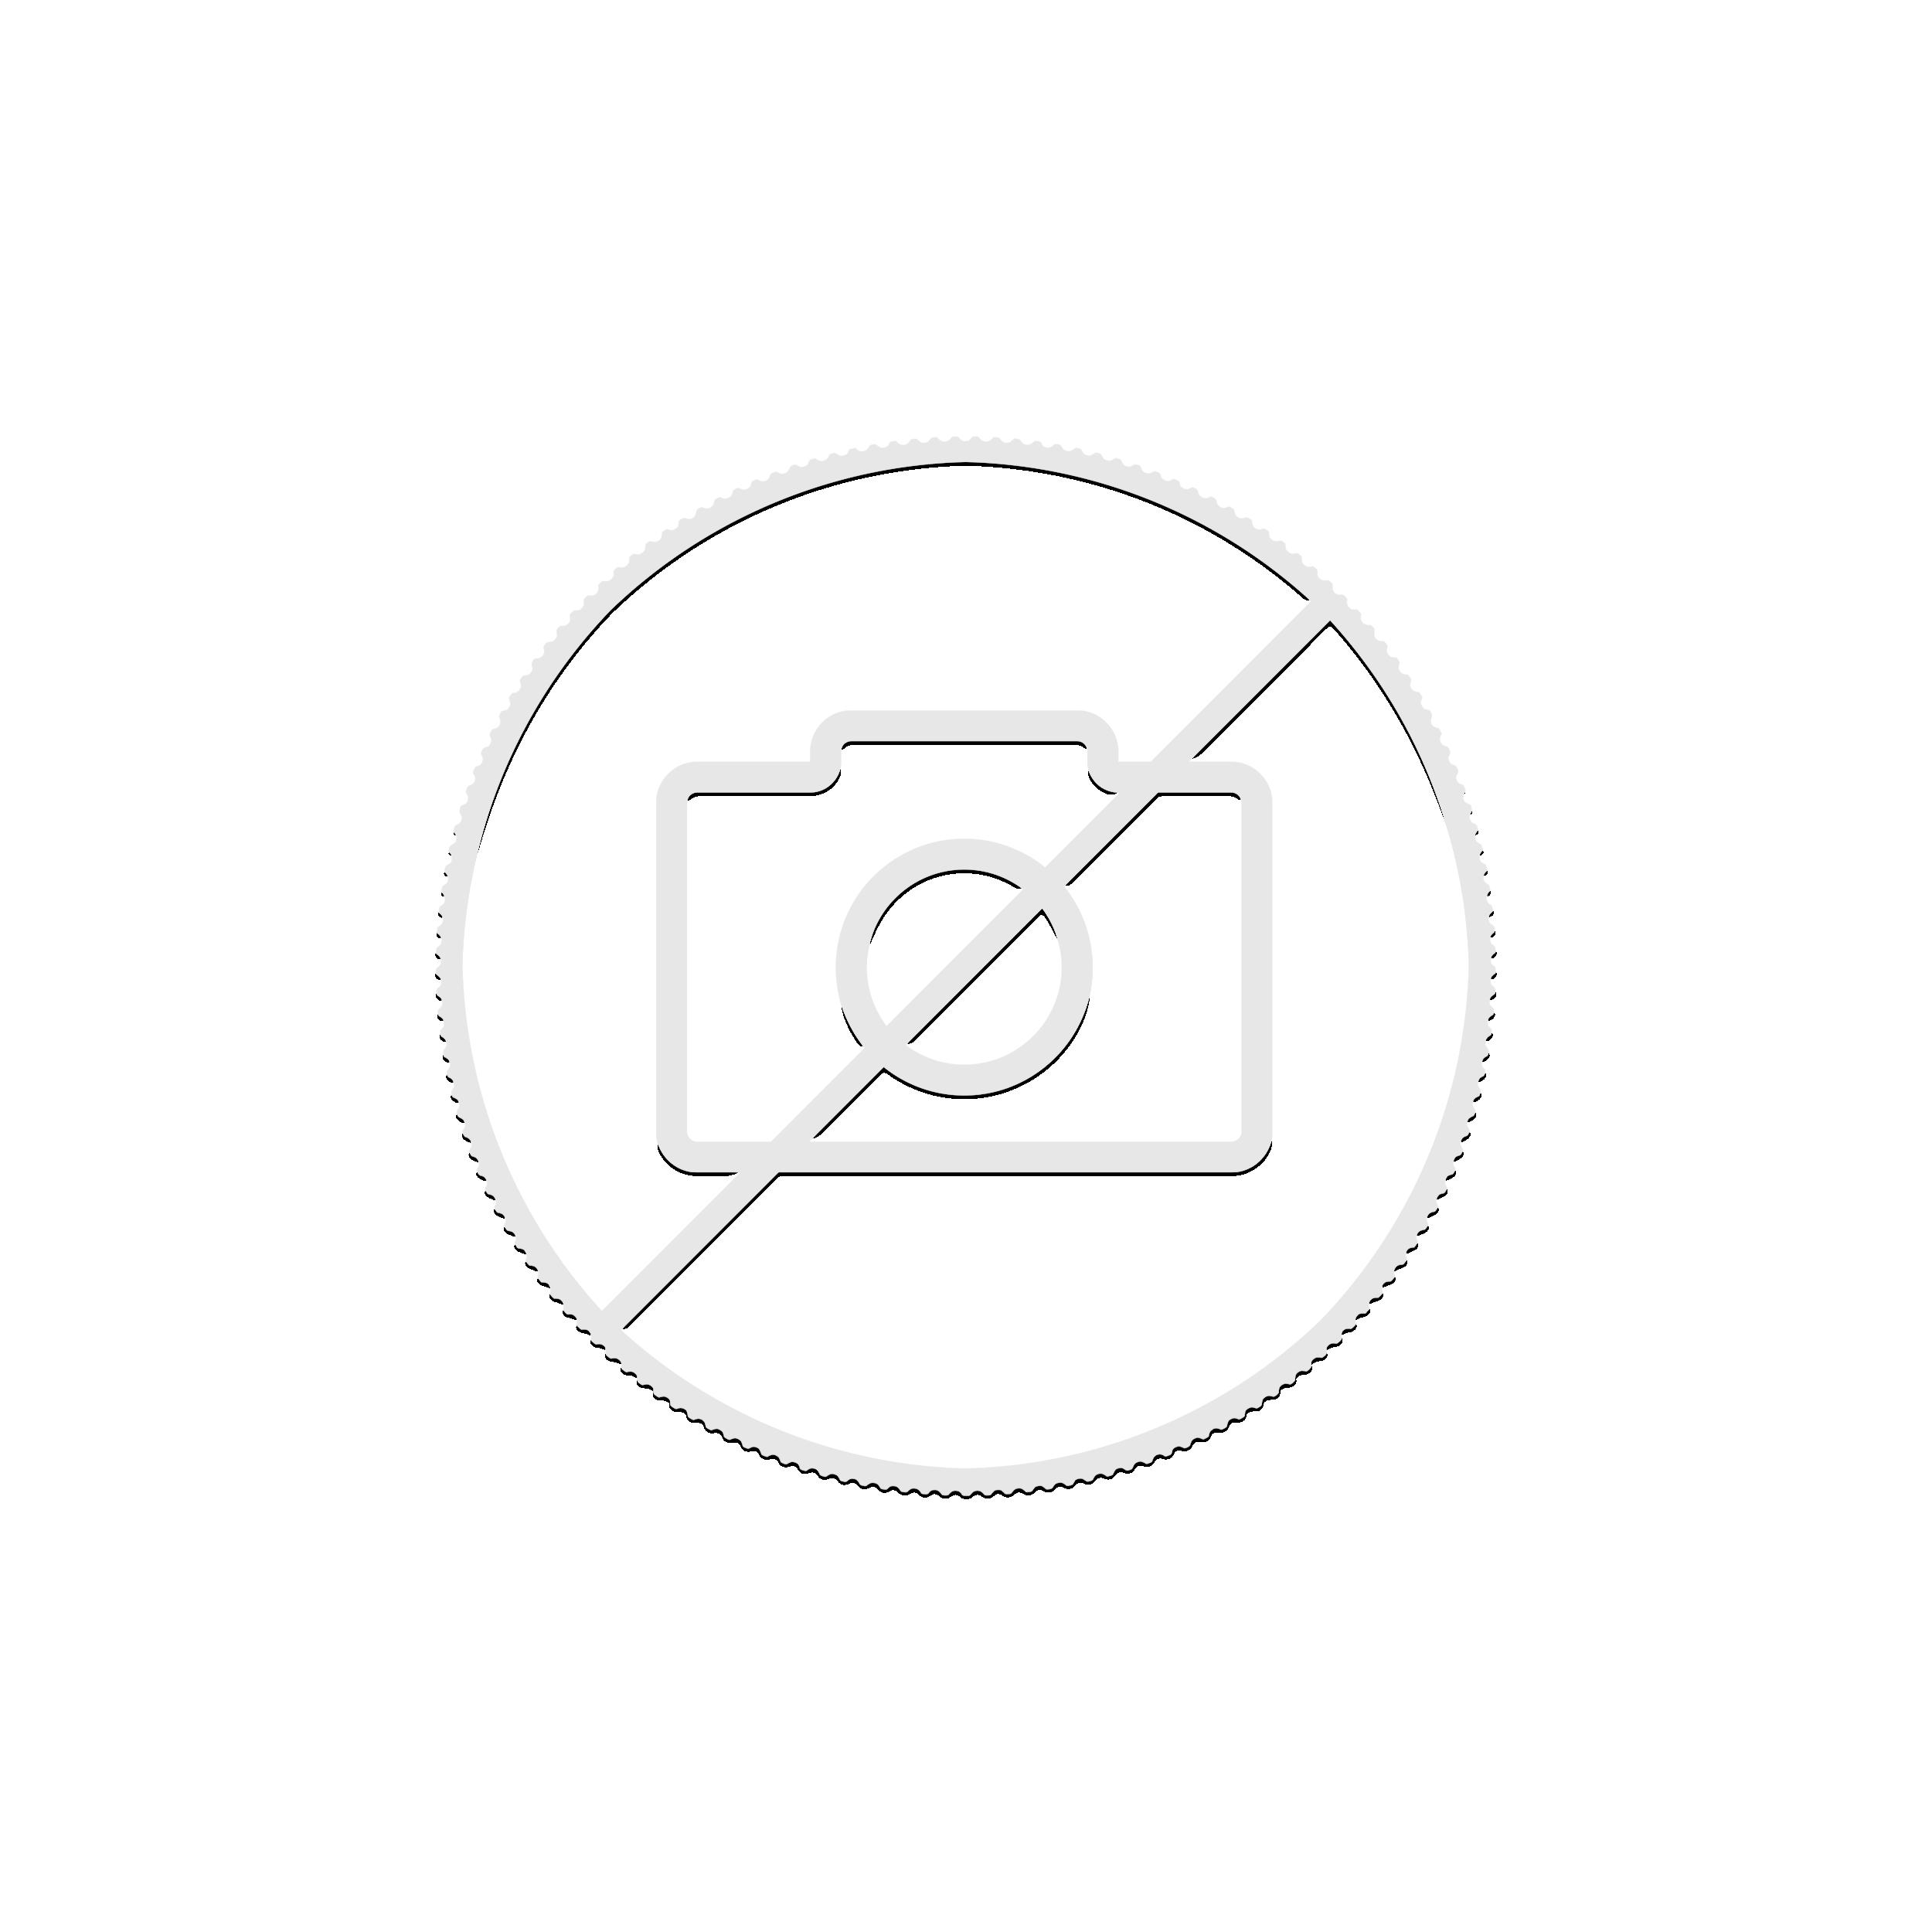 1 troy ounce gold coin American Buffalo